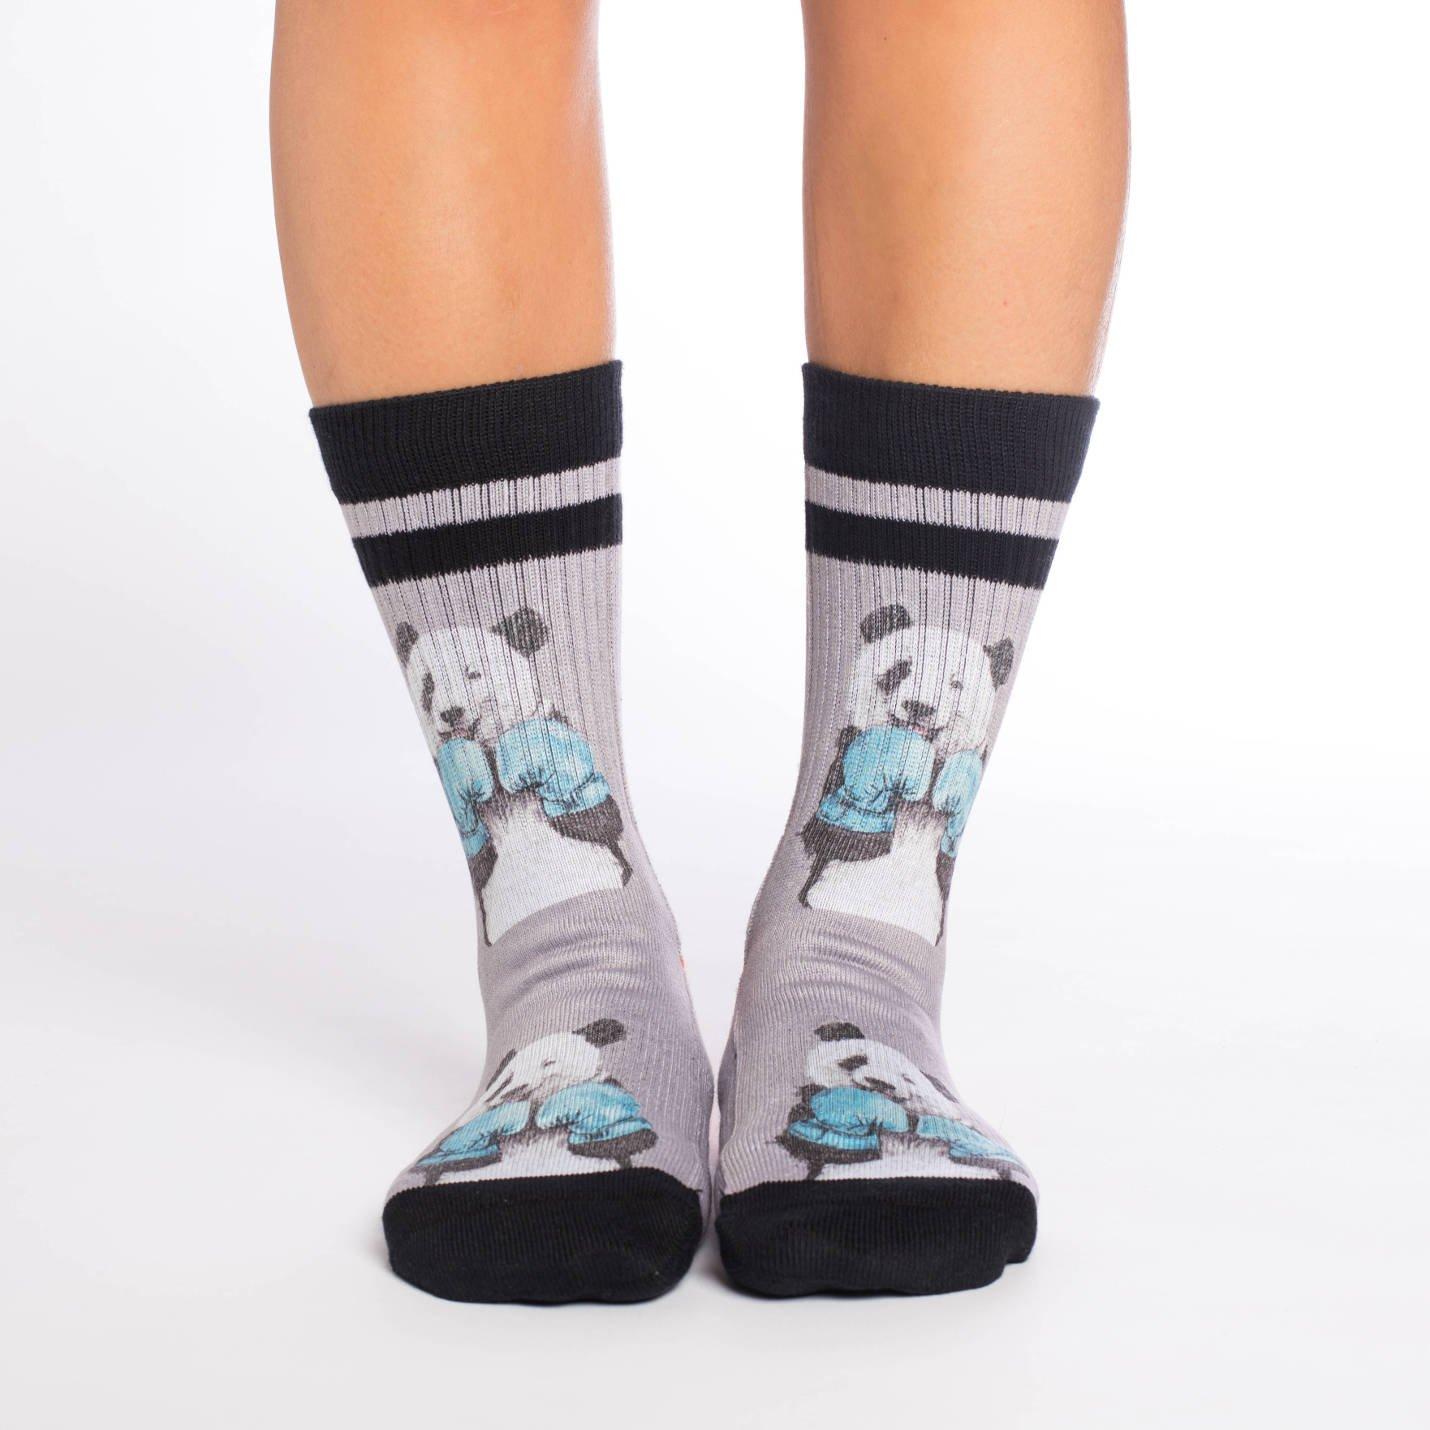 Good Luck Sock Womens Boxing Panda Crew Socks Adult Shoe Size 5-9 Grey